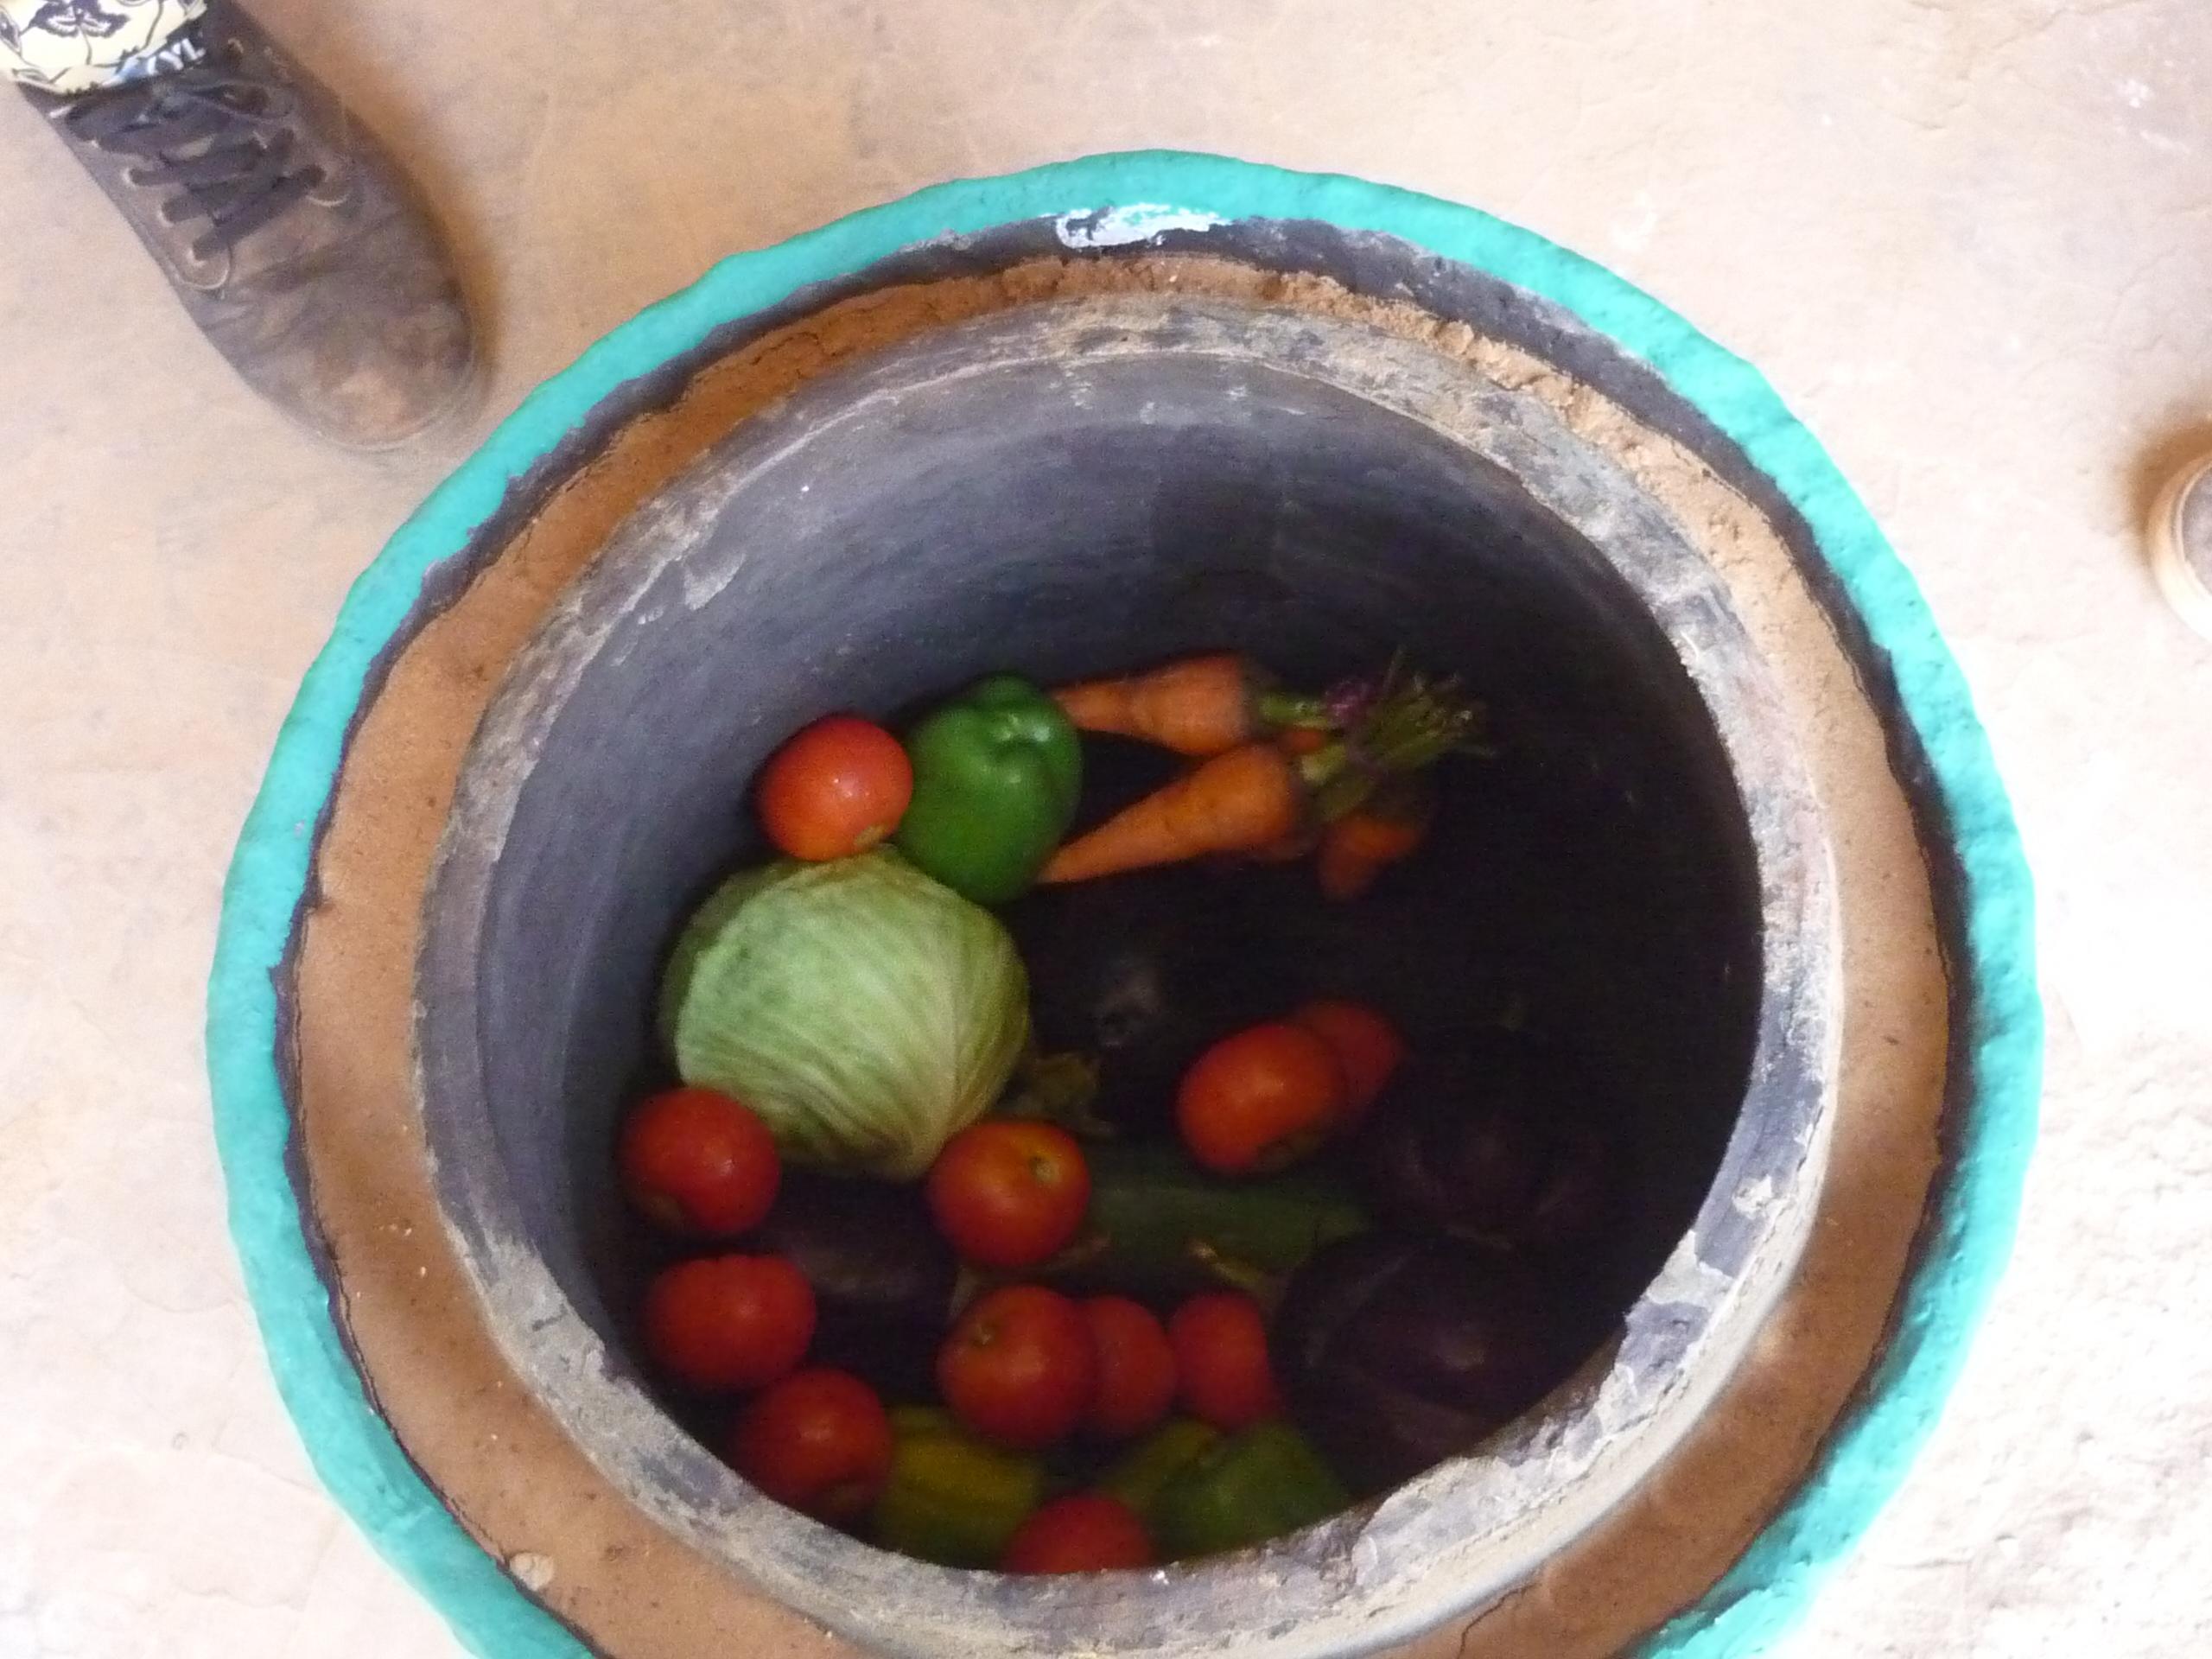 Pot-in-pot refrigerator - Wikipedia